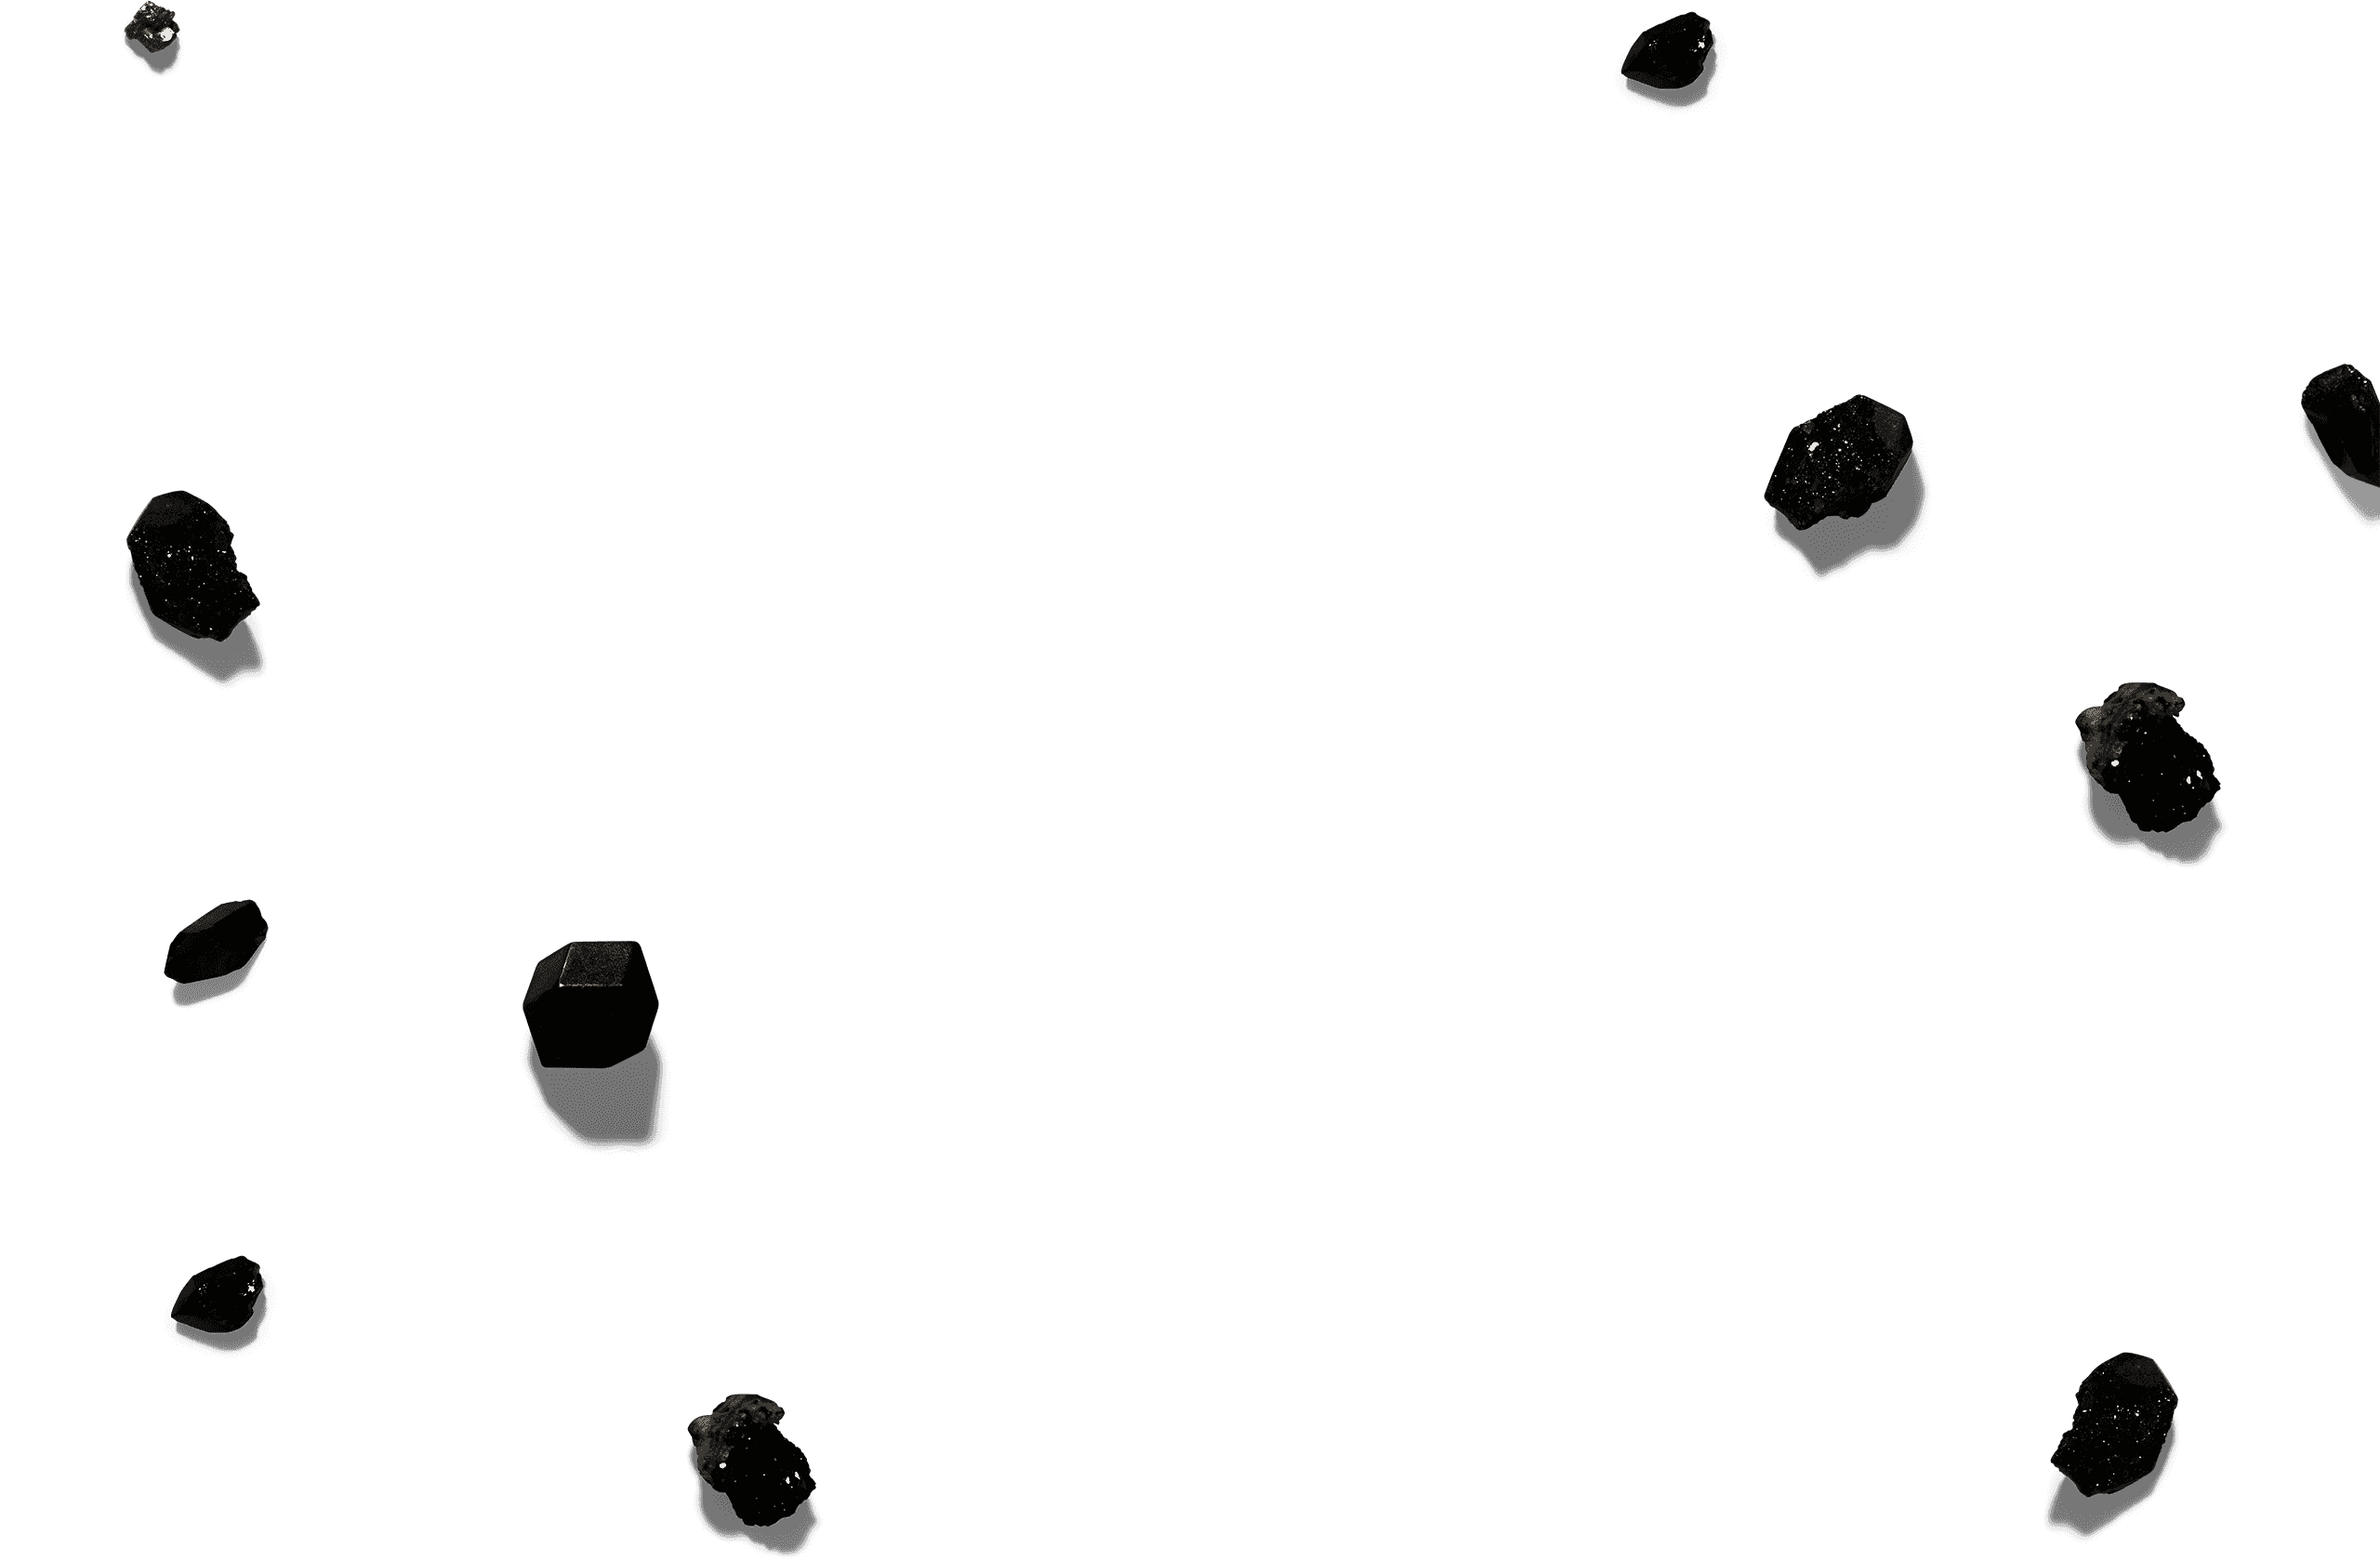 Luna_Poster_for-web-scroll_05-compressor